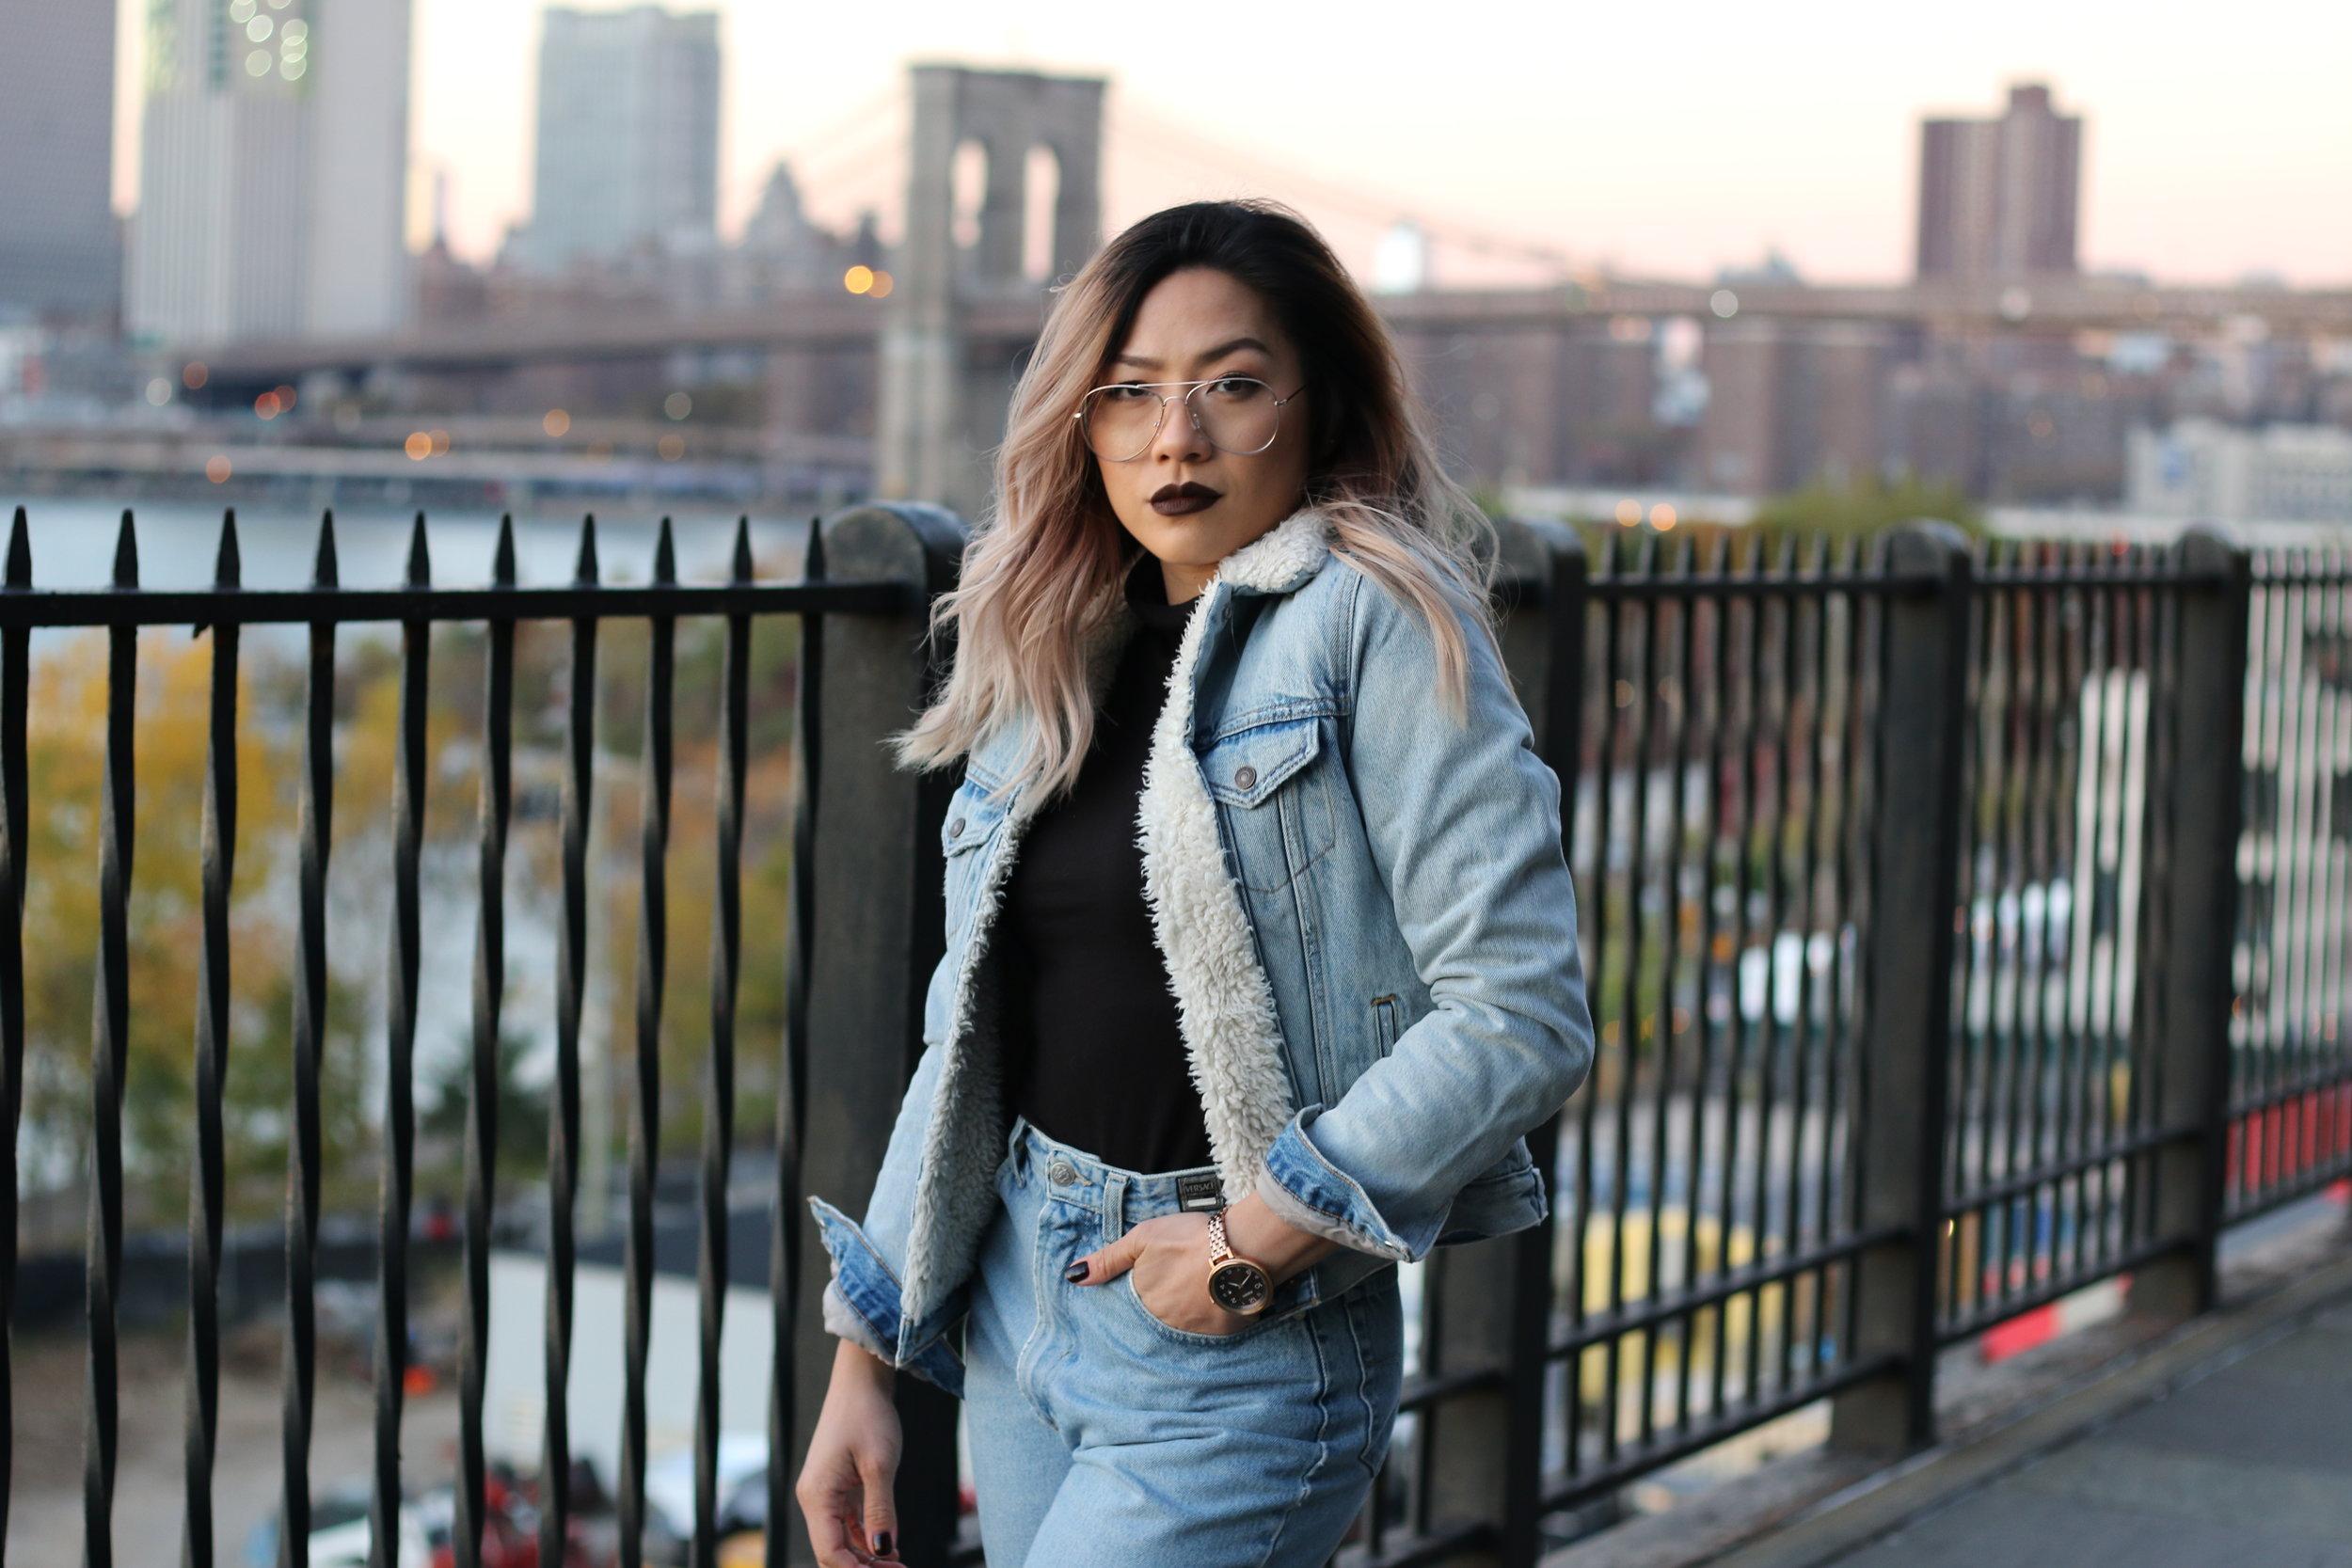 mom jeans, levis women sherpa trucker jacket, mom jeans, vintage style outfit